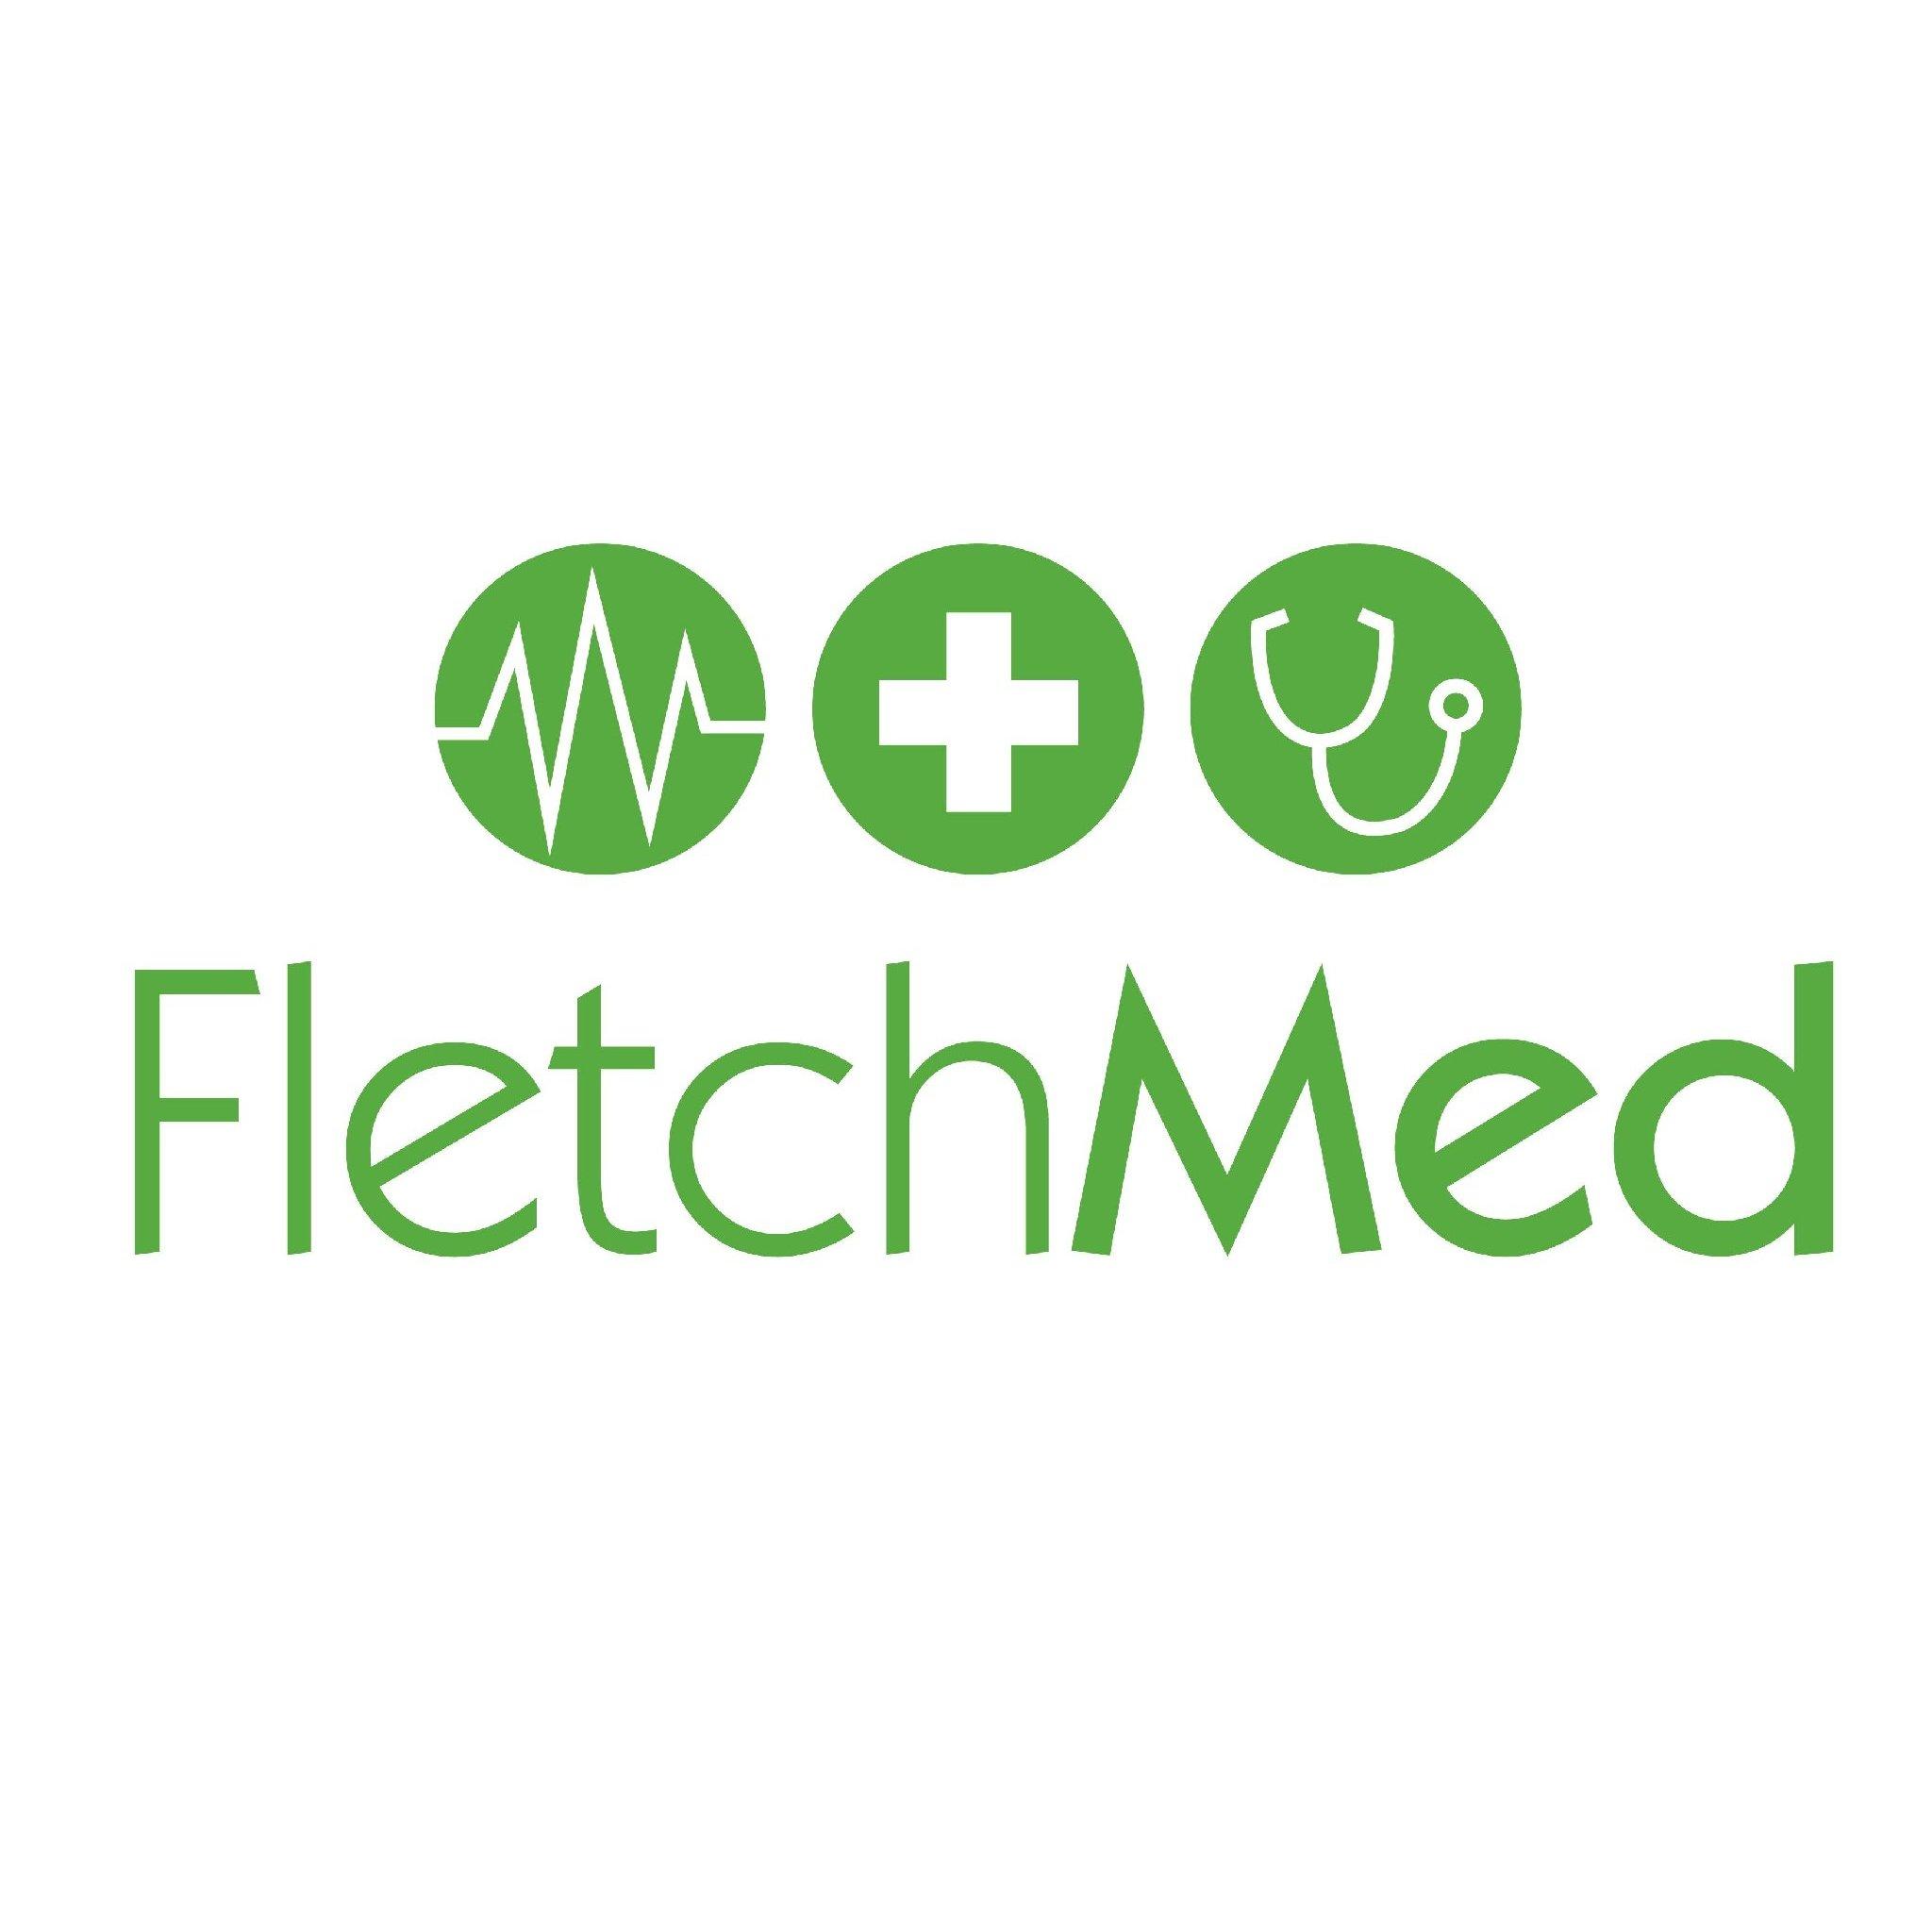 FletchMed